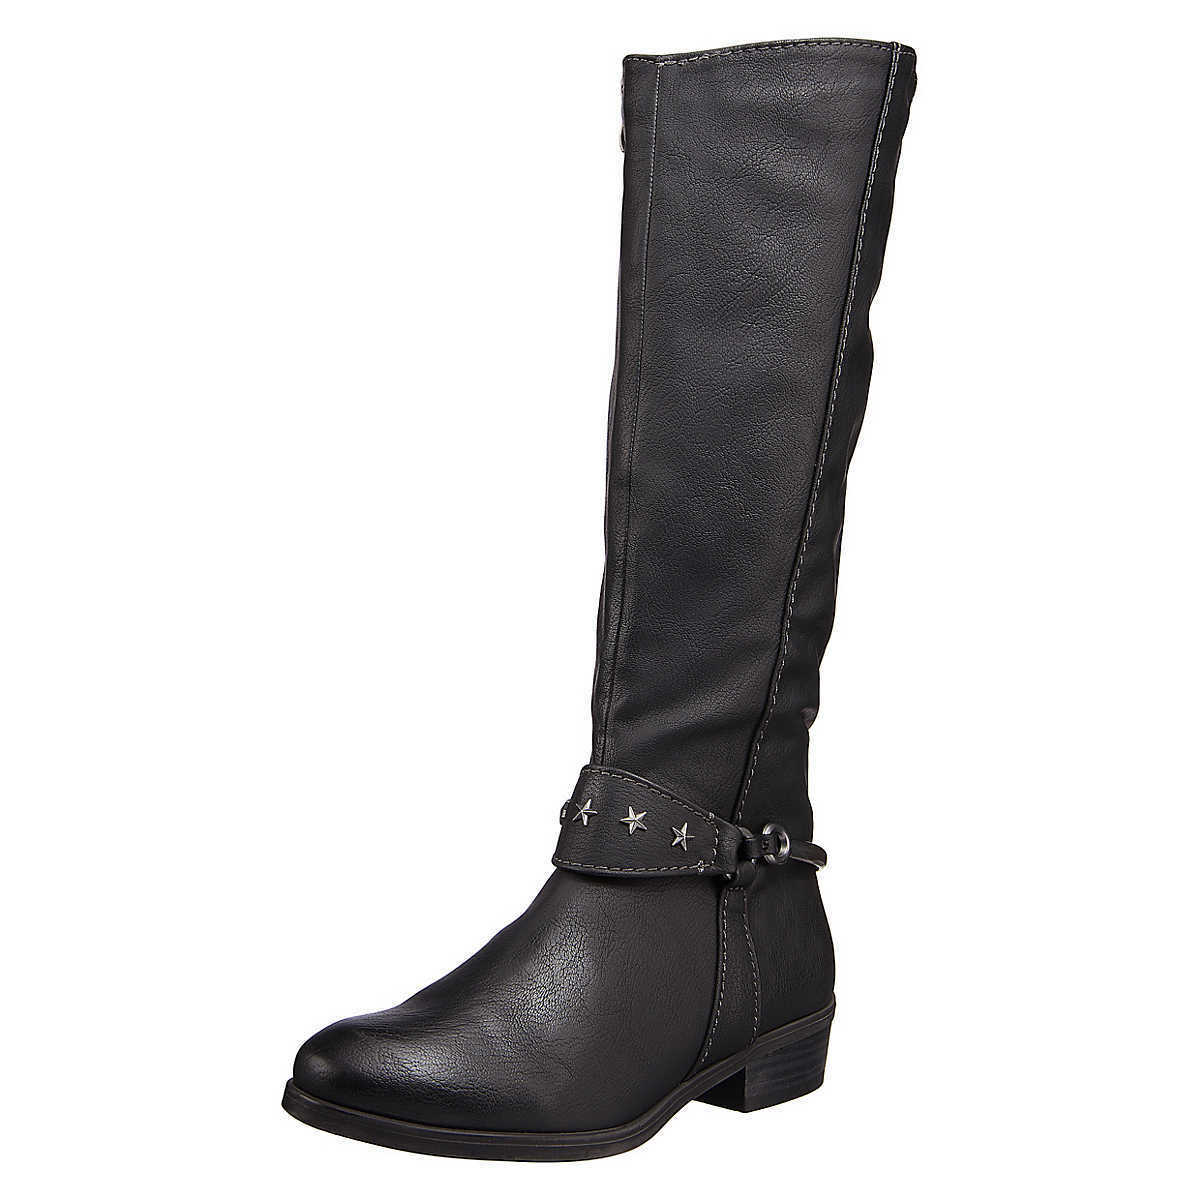 MARCO TOZZI Damen Stiefel Damenschuhe, Boots, schwarz, EU 39